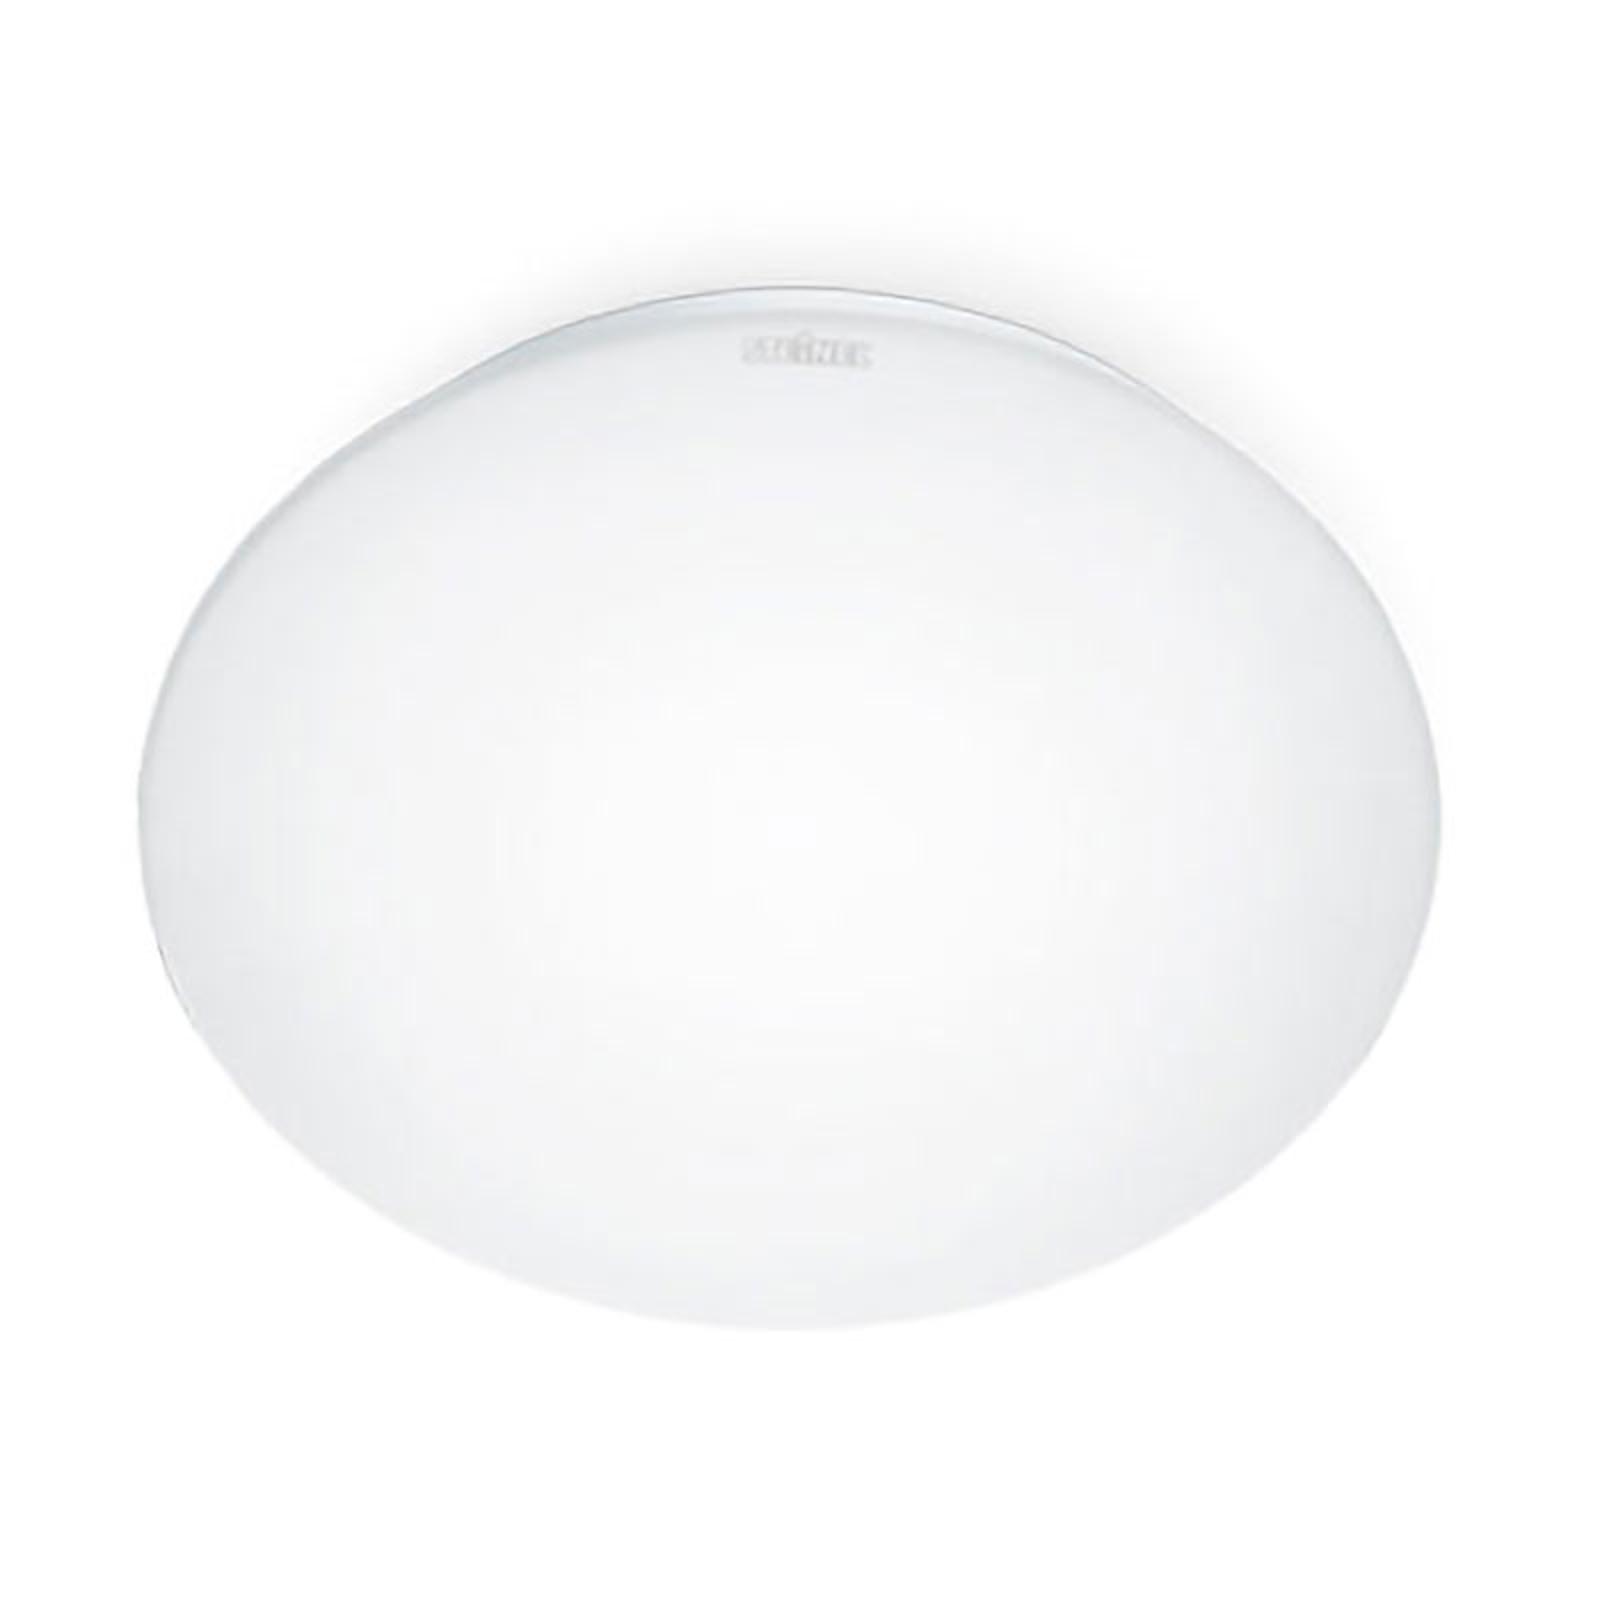 Glazen LED plafondlamp RS 16 met sensor